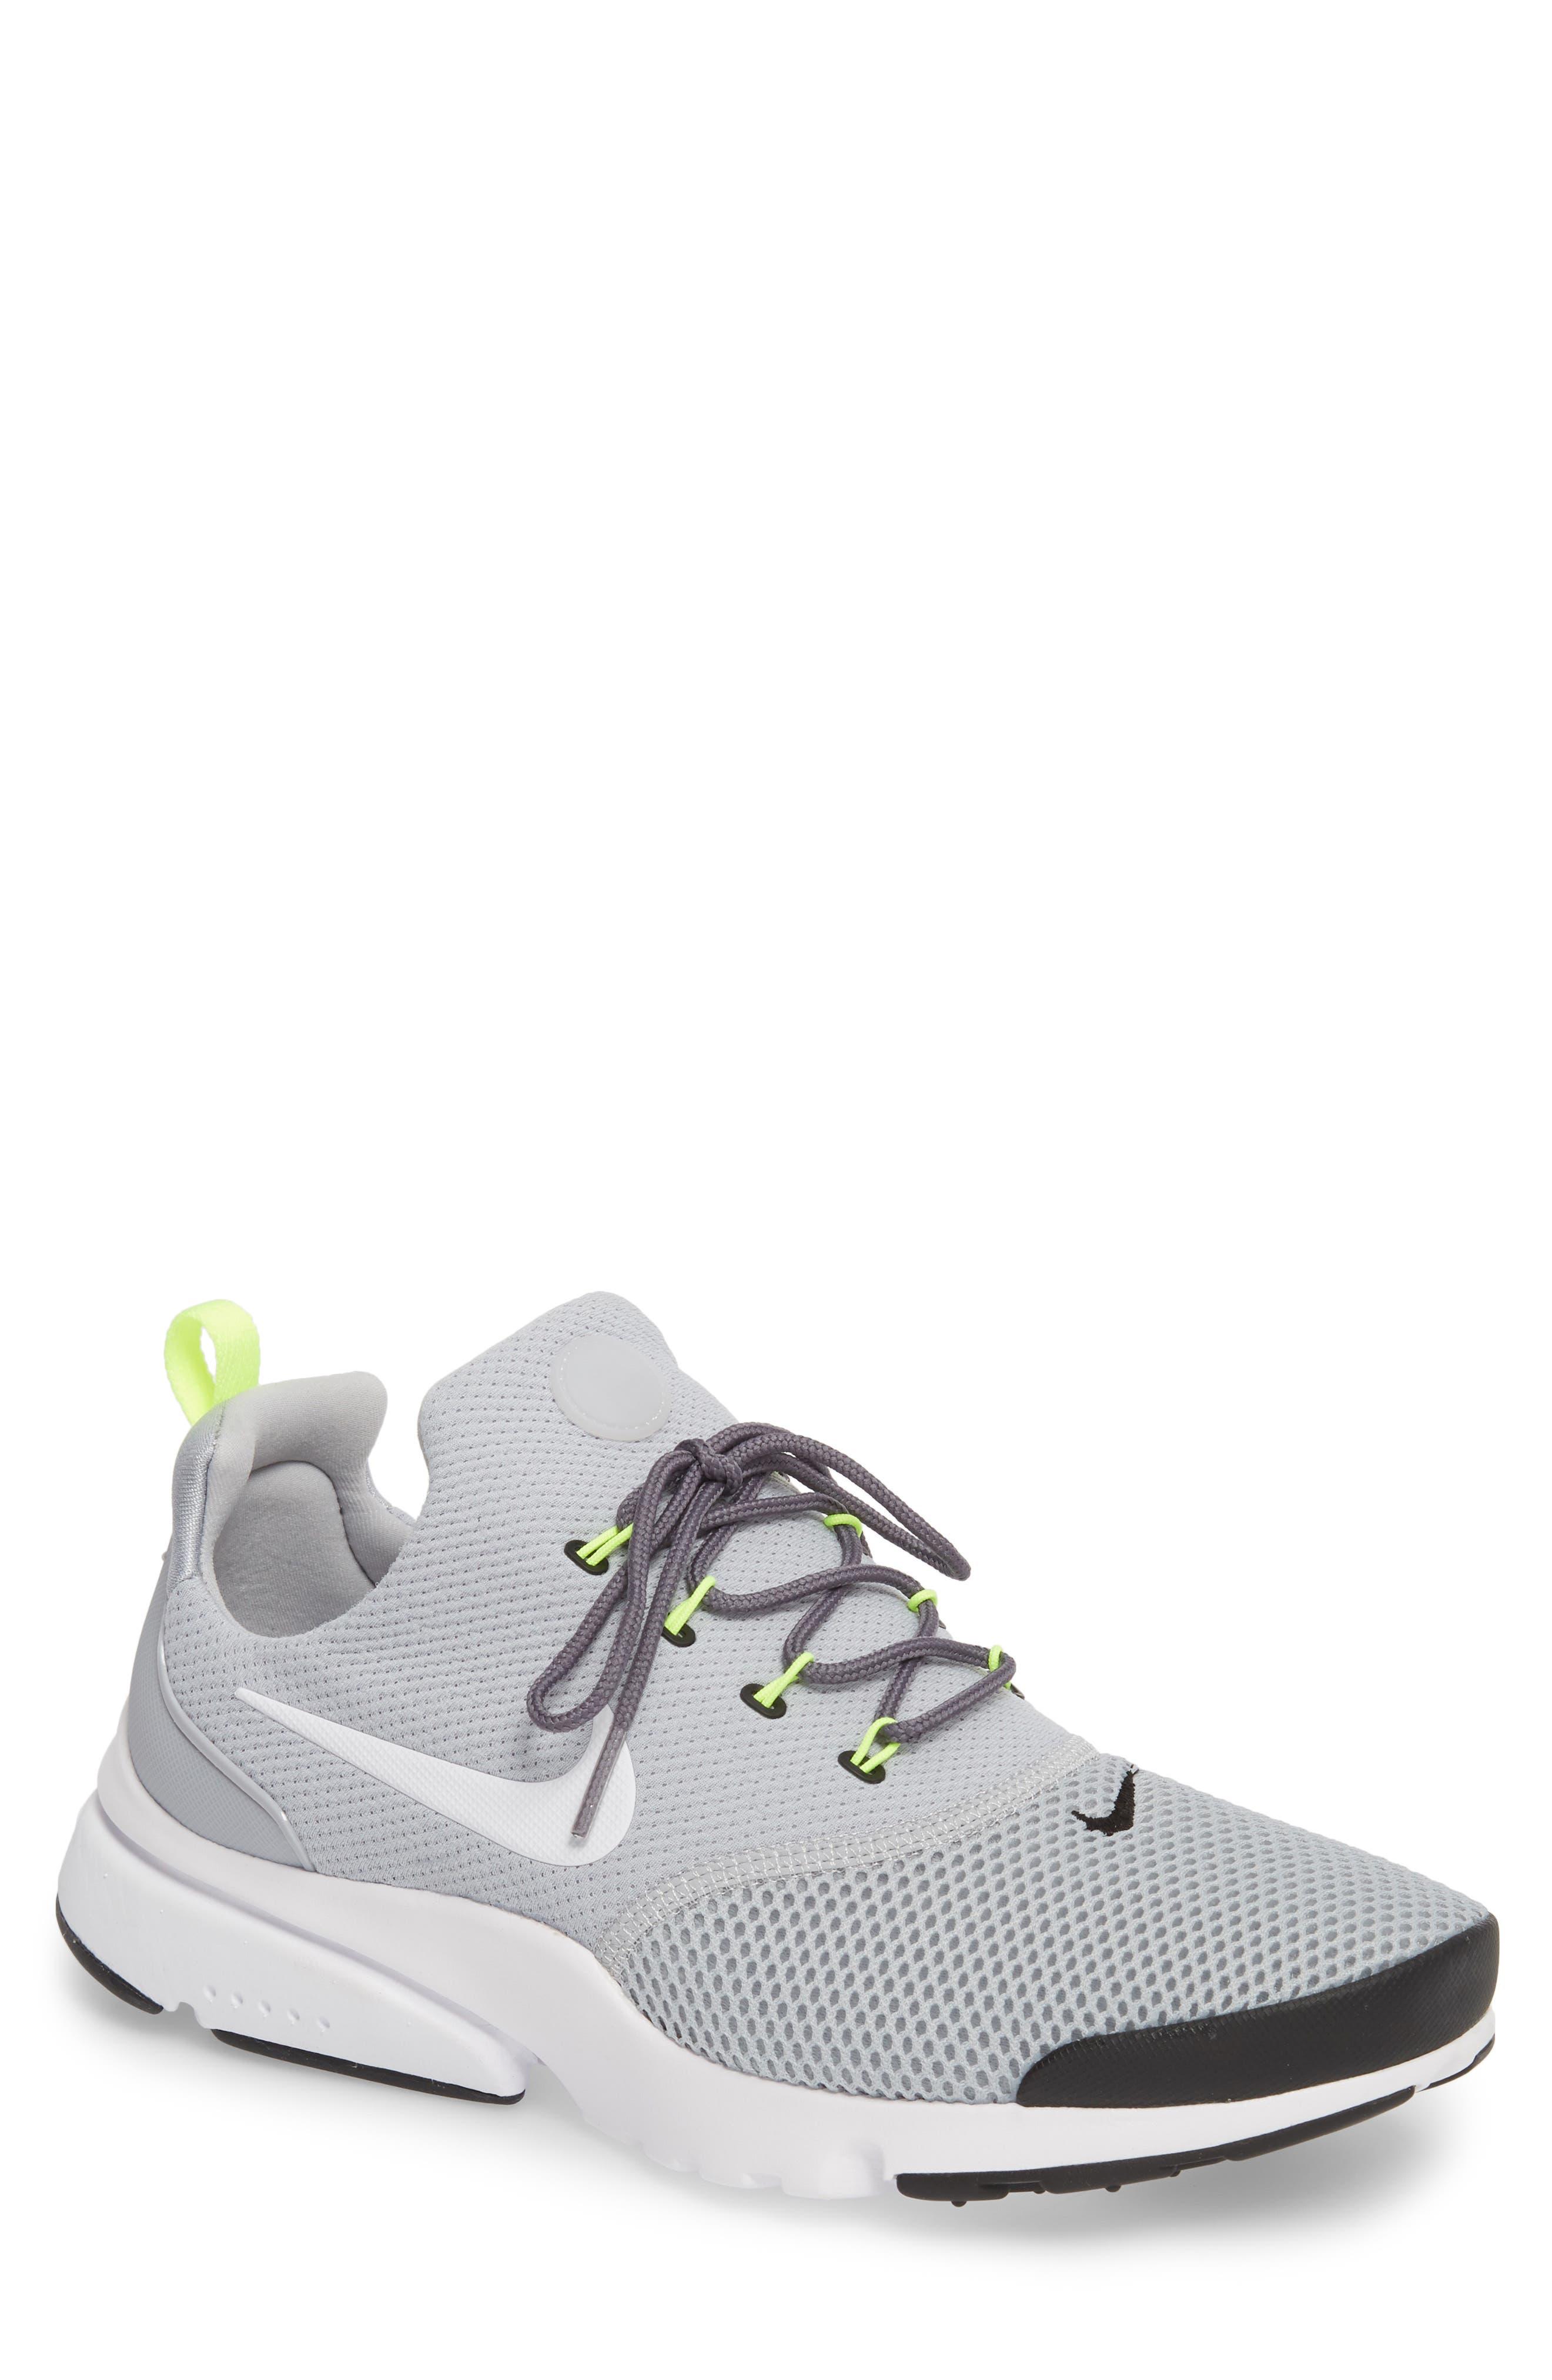 Presto Fly Sneaker,                         Main,                         color, Wolf Grey/ White/ Volt